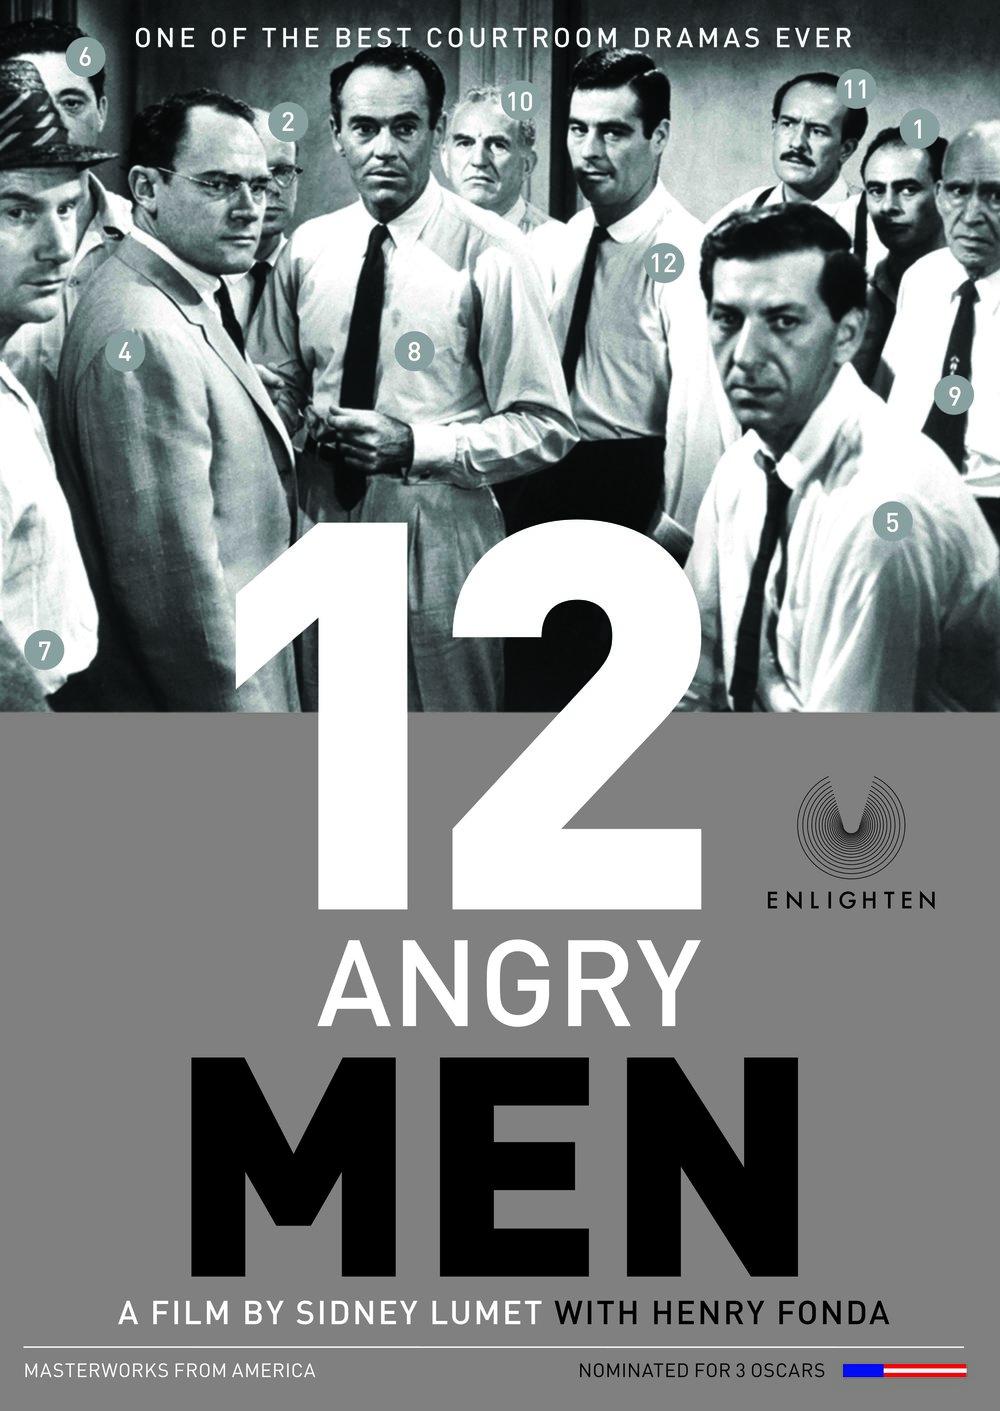 12 angry men_2.jpg